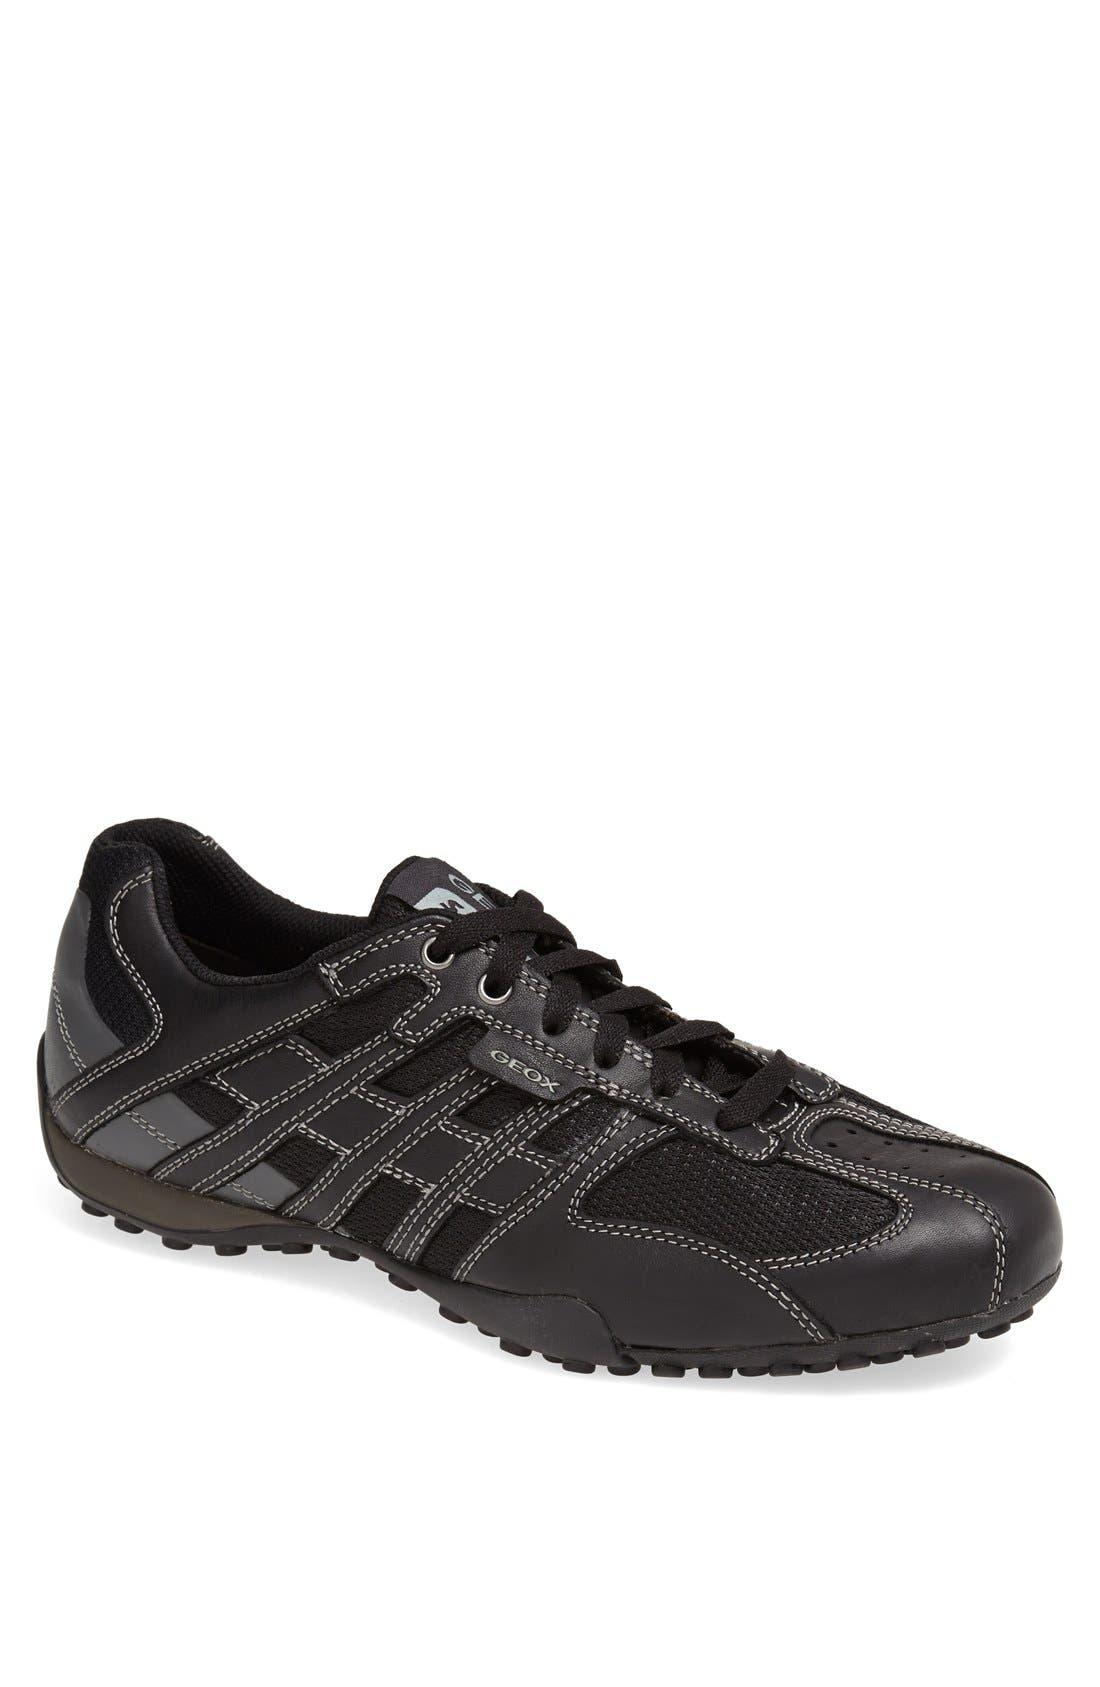 'Snake 95' Sneaker,                             Main thumbnail 1, color,                             BLACK/ LEAD